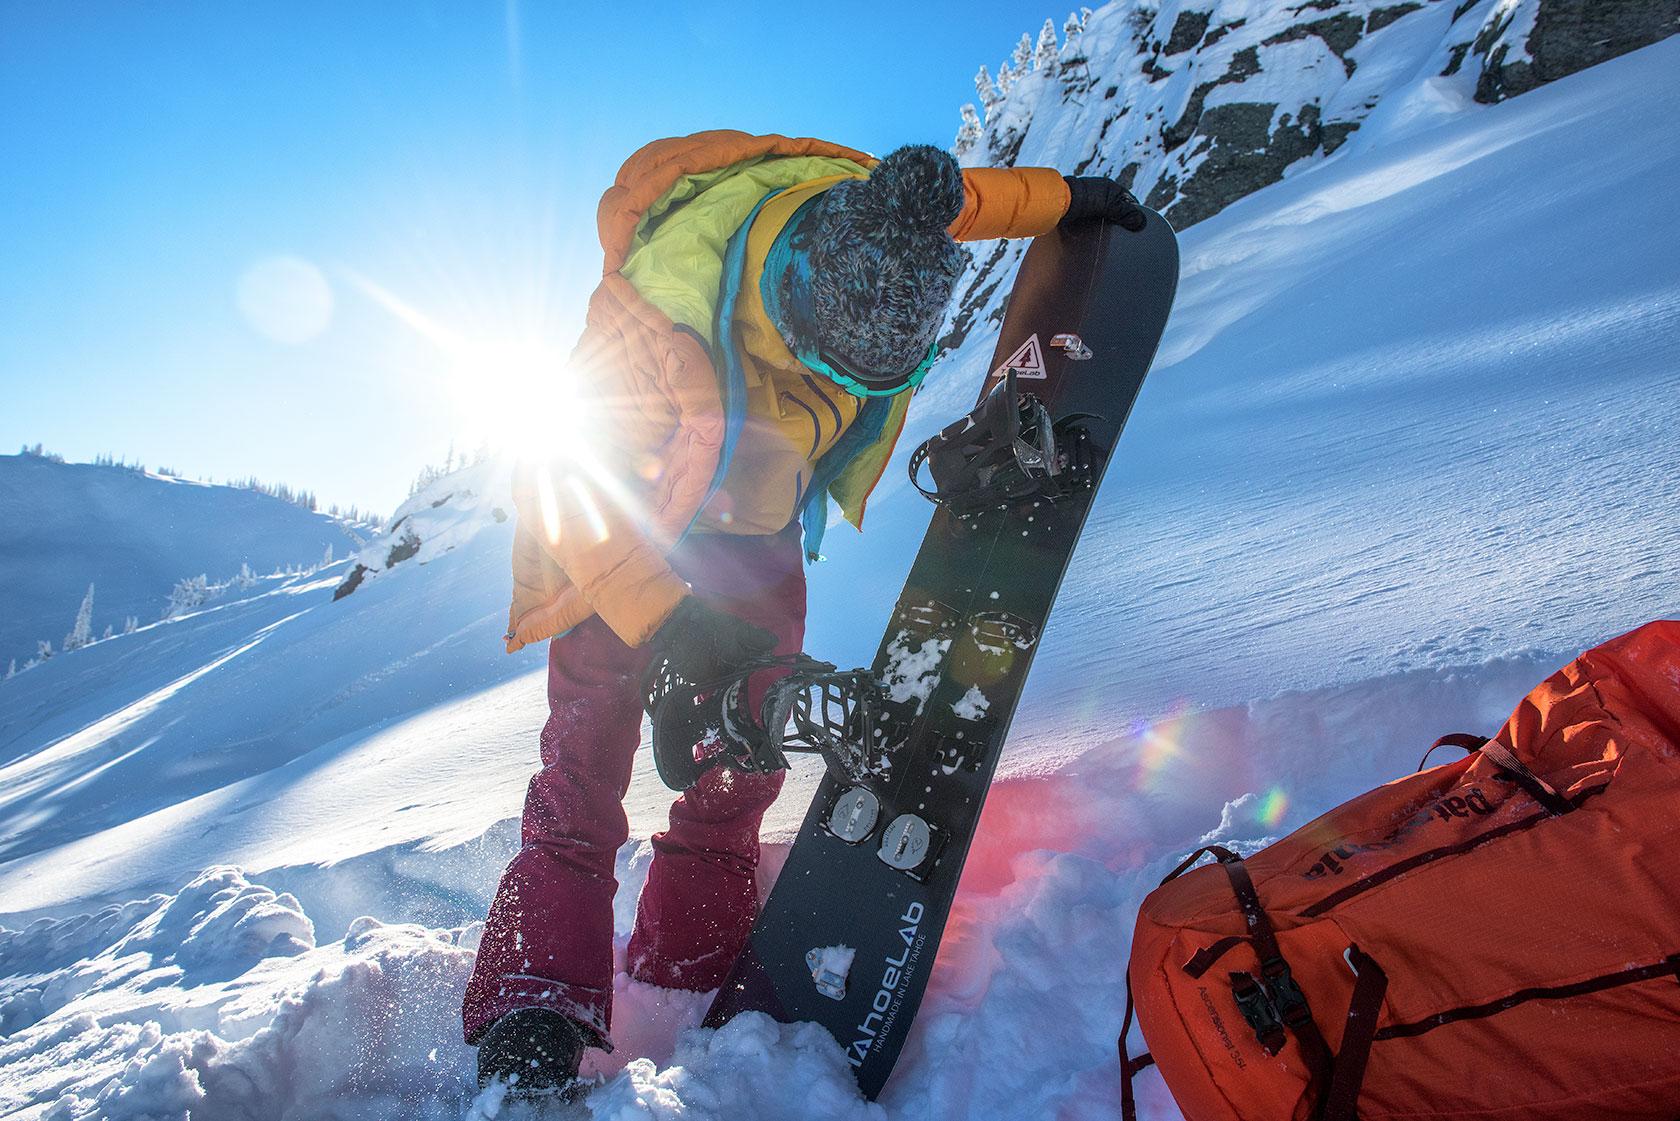 austin-trigg-patagonia-banff-alberta-winter-rogers-pass-canada-splitboard-touring-powder-adventure.jpg